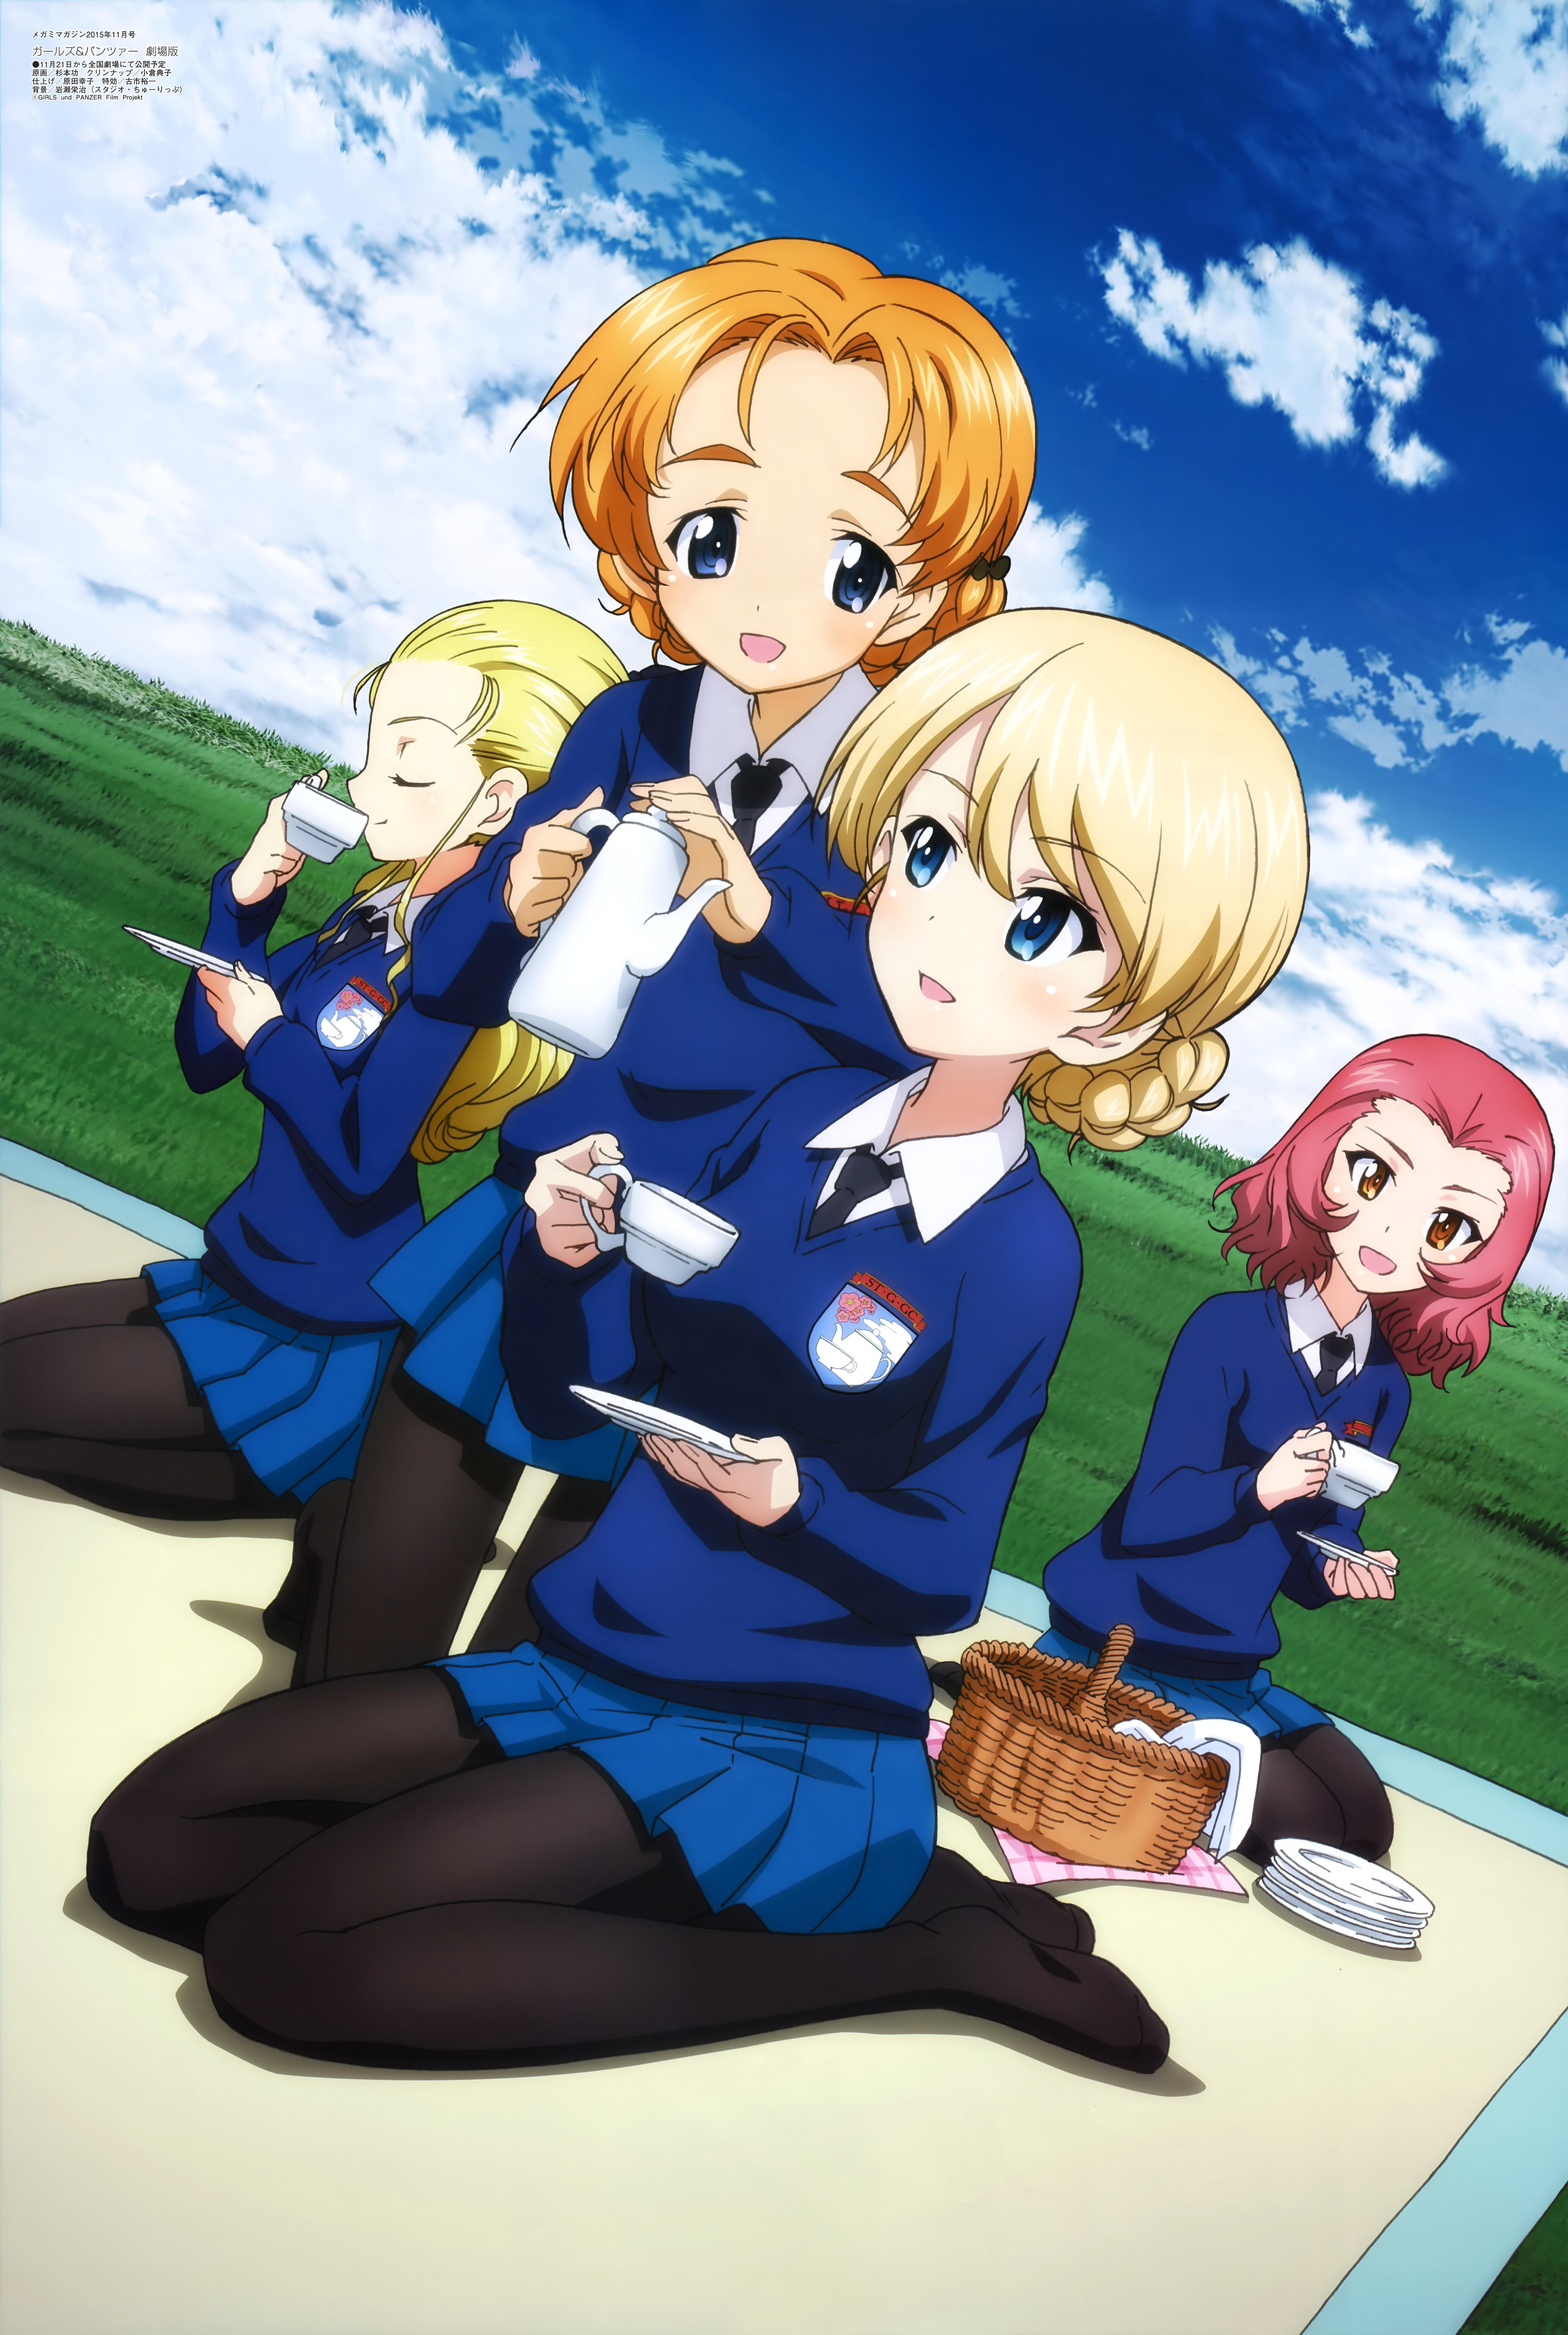 Darjeeling GIRLS und PANZER Mobile Wallpaper Zerochan Anime